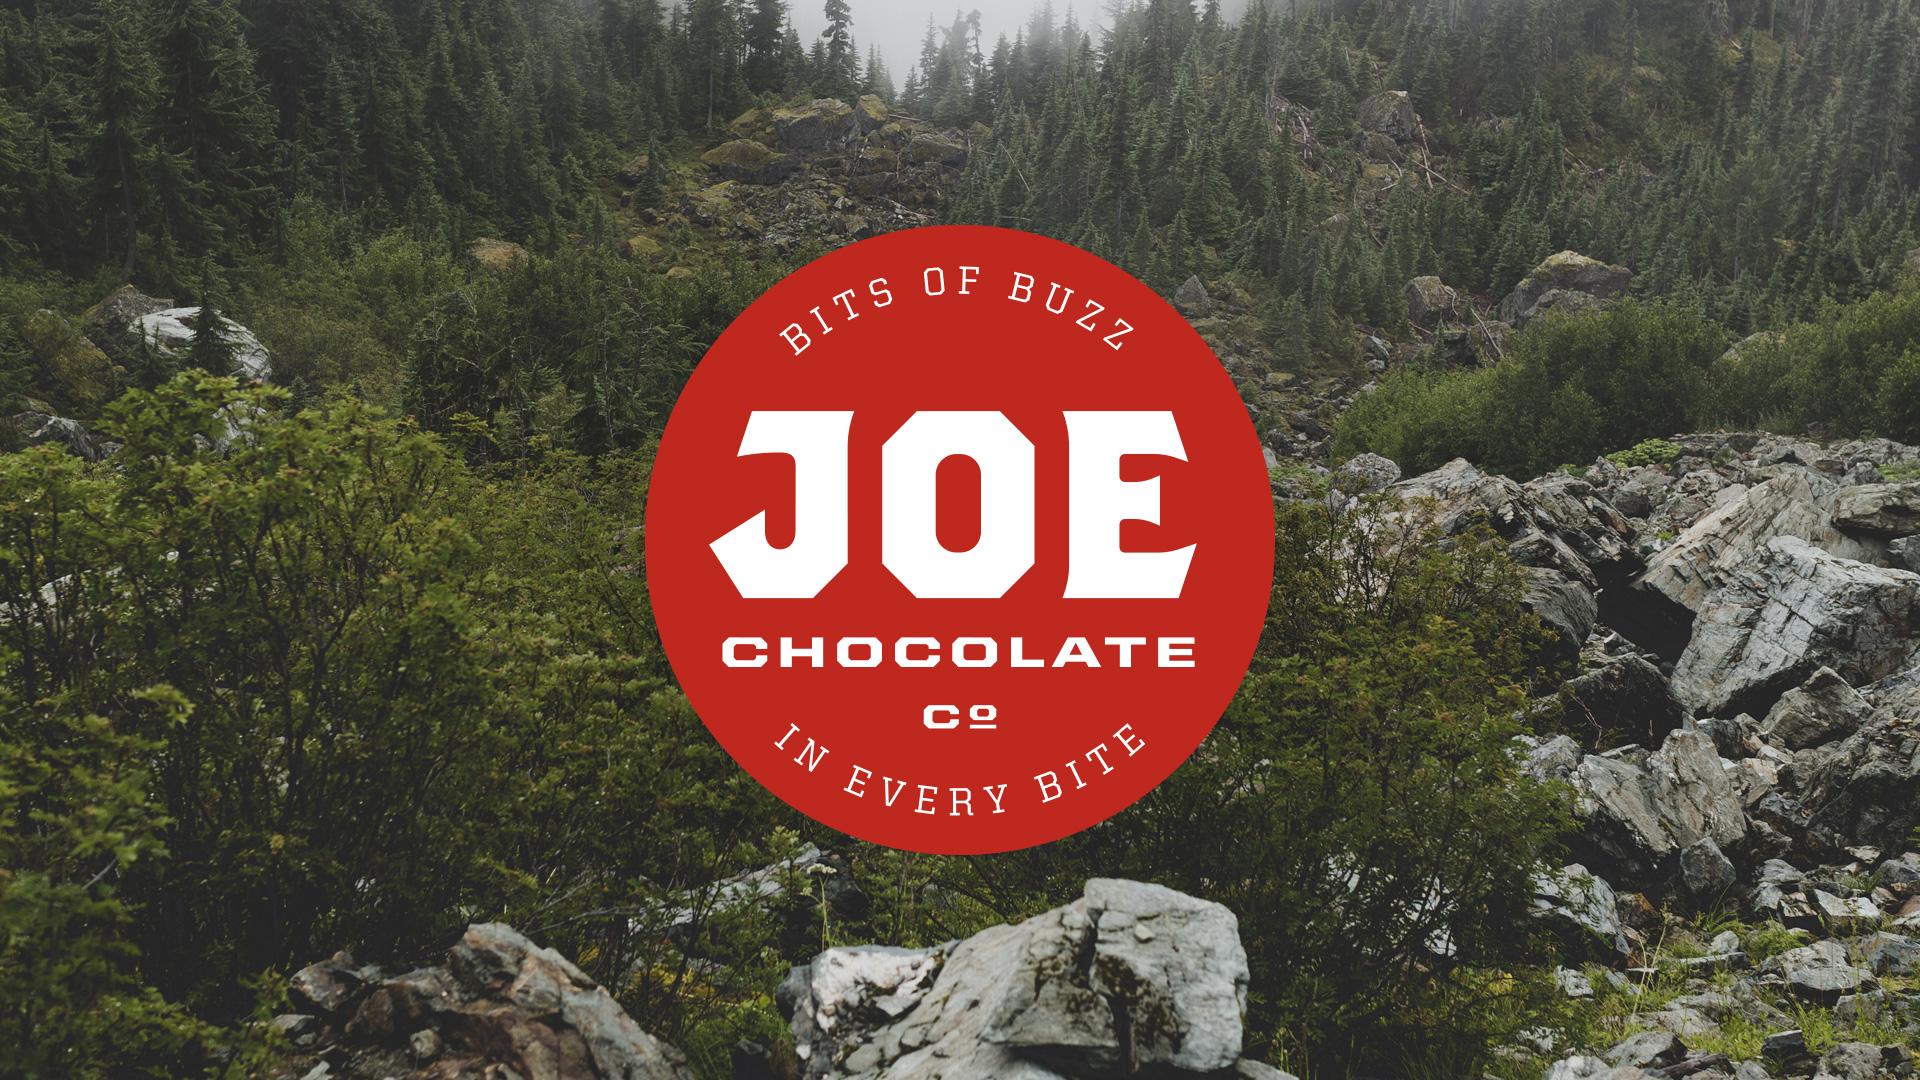 Joe-01b.jpg